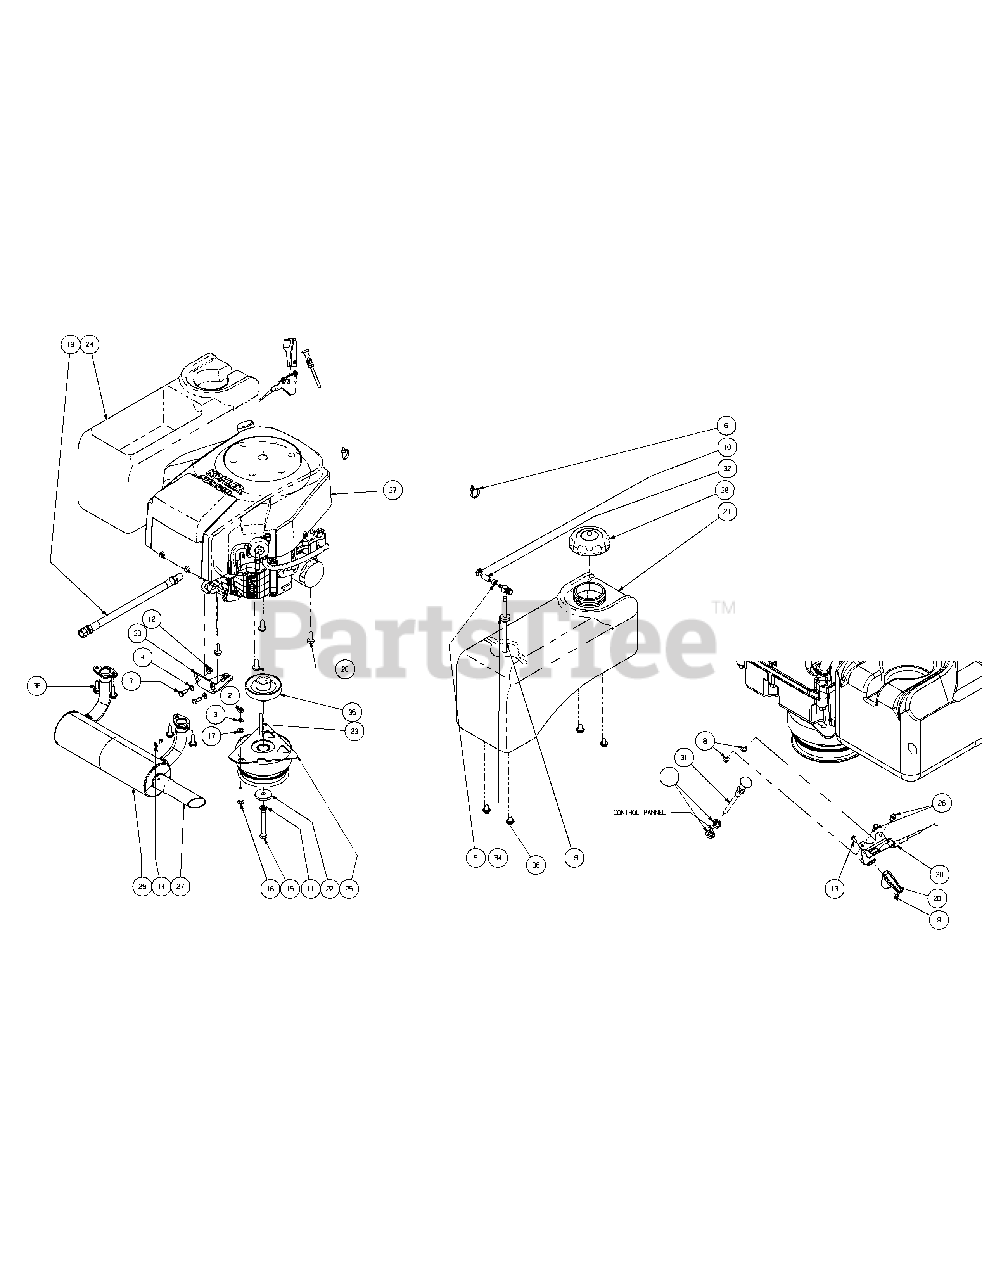 Cub Cadet Parts on the Kohler Engine Assembly 23HP Diagram